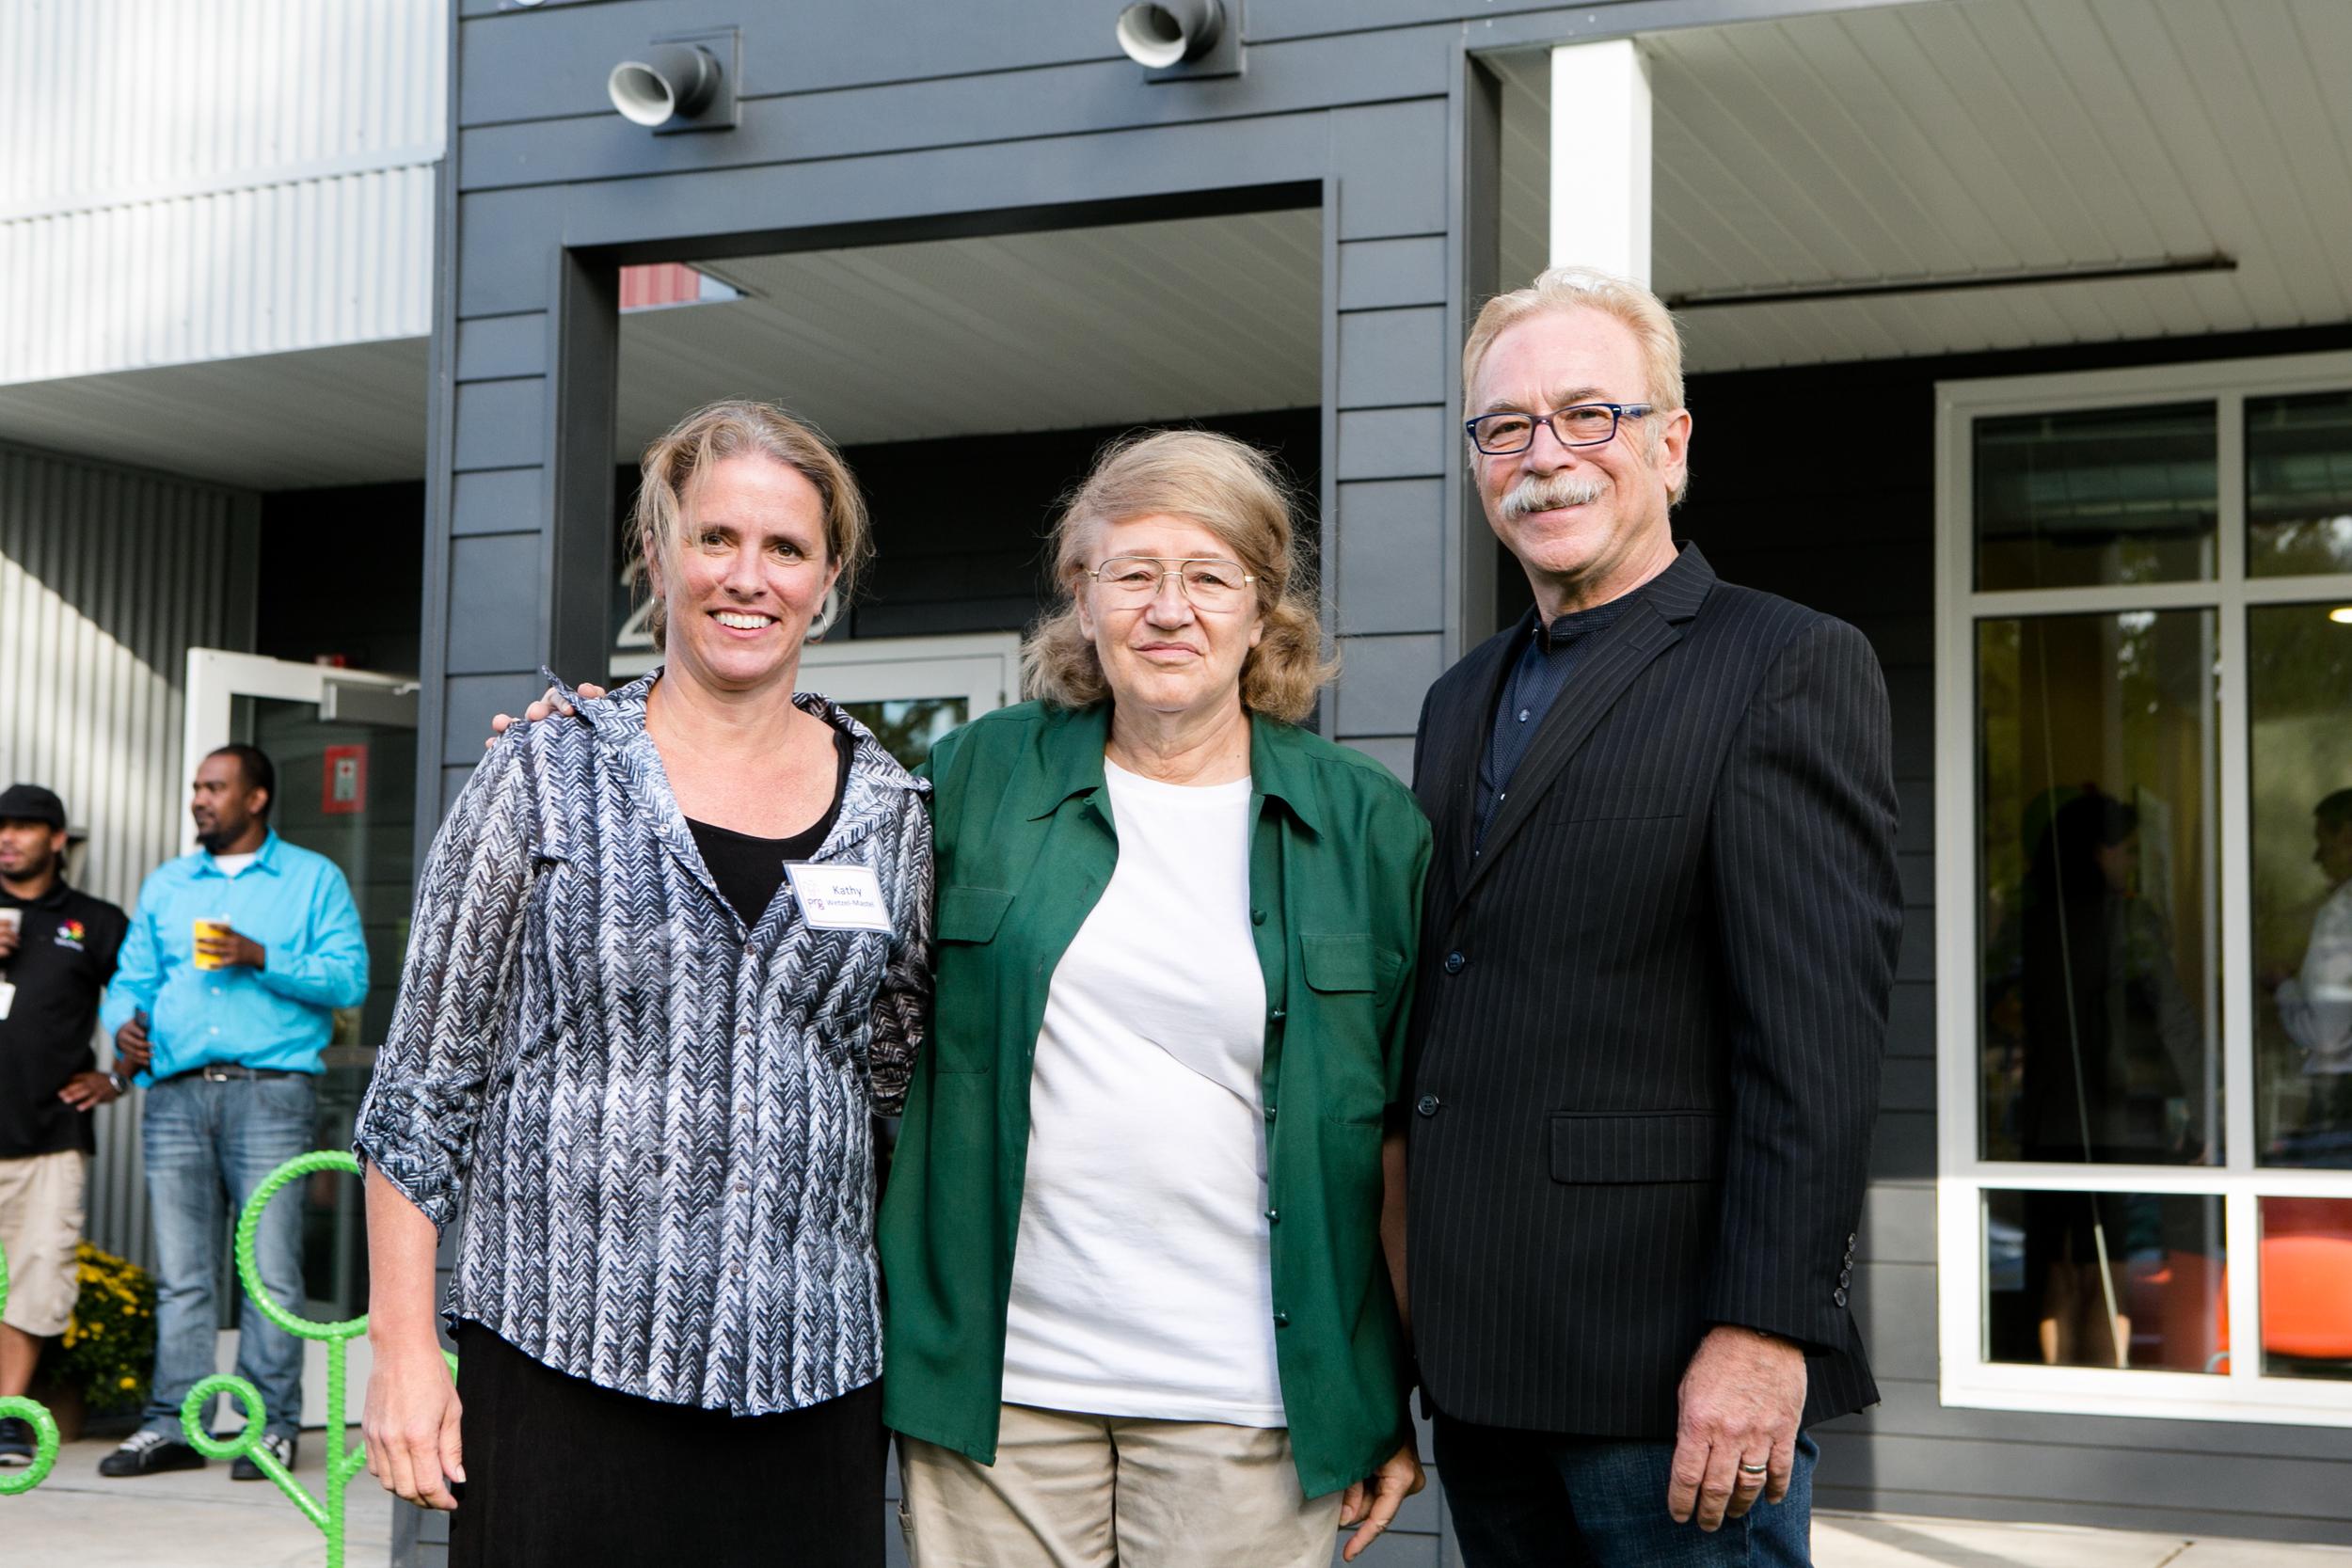 Project leaders Kathy Wetzel-Mastel of PRG, Inc., Carol Pass of EPIC, and Loren Brueggemann of Phoenix Development, Inc.